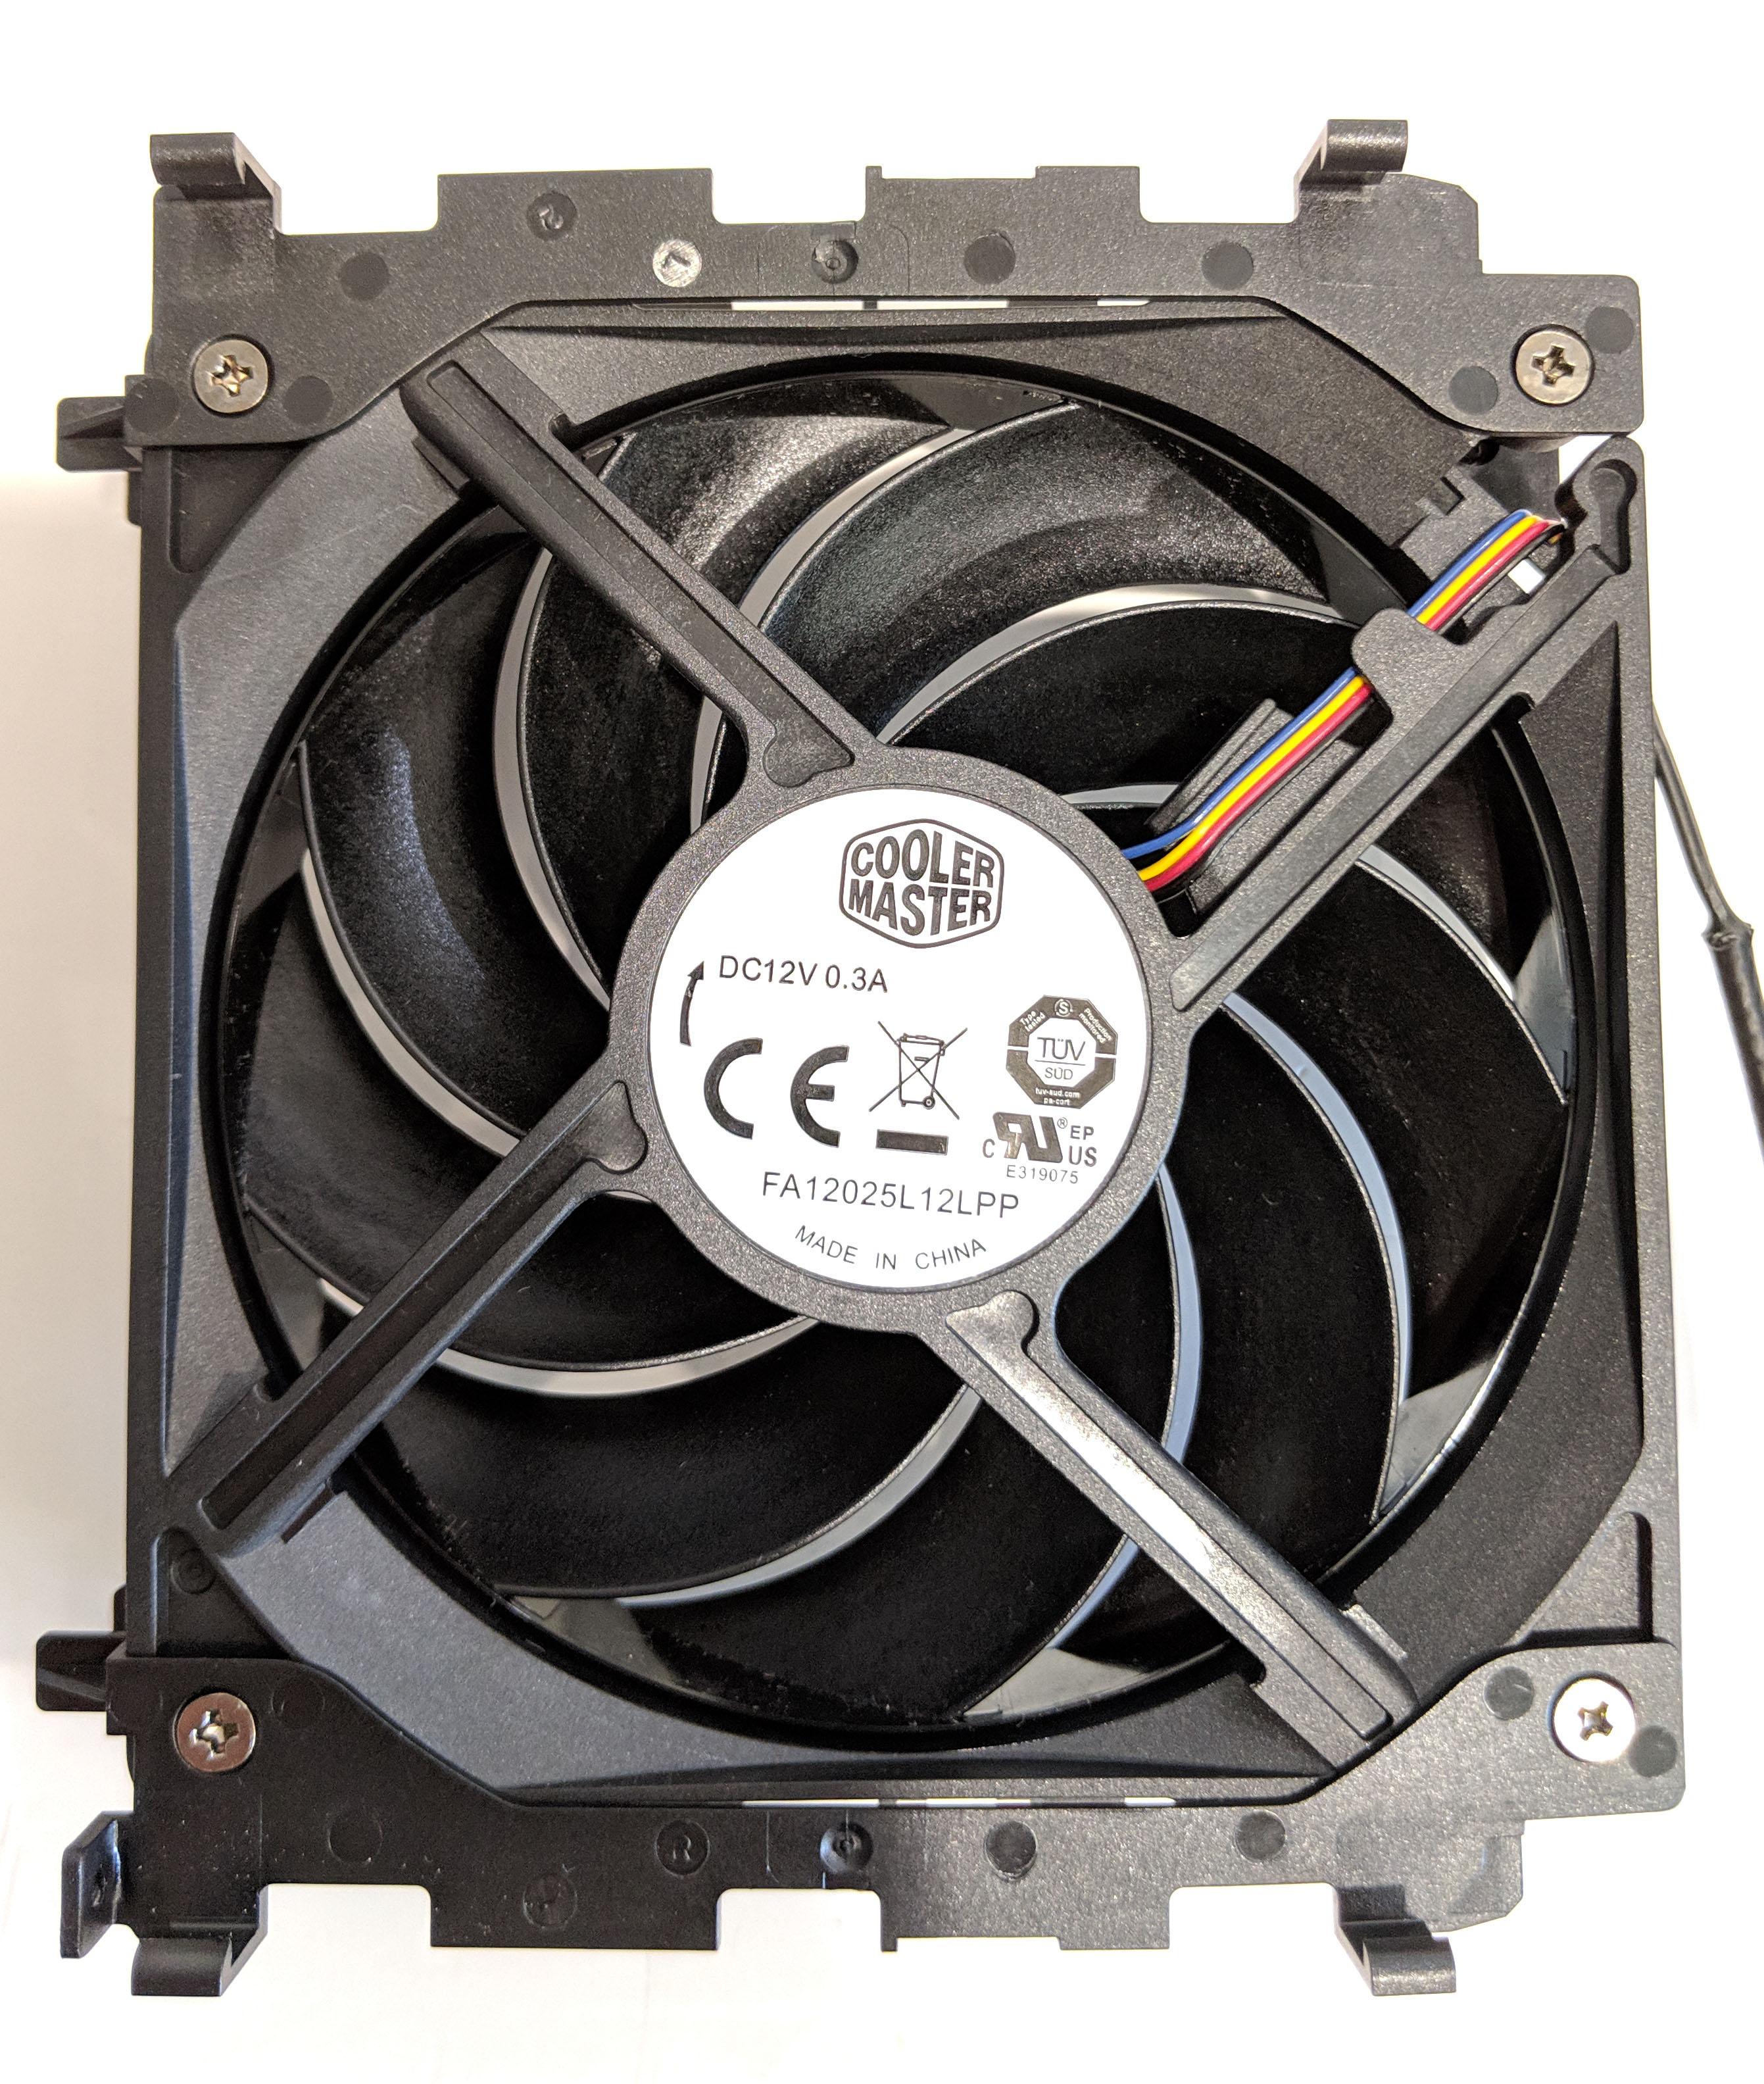 Cooler Master Wraith Ripper CPU Cooler Feature Review – GND-Tech